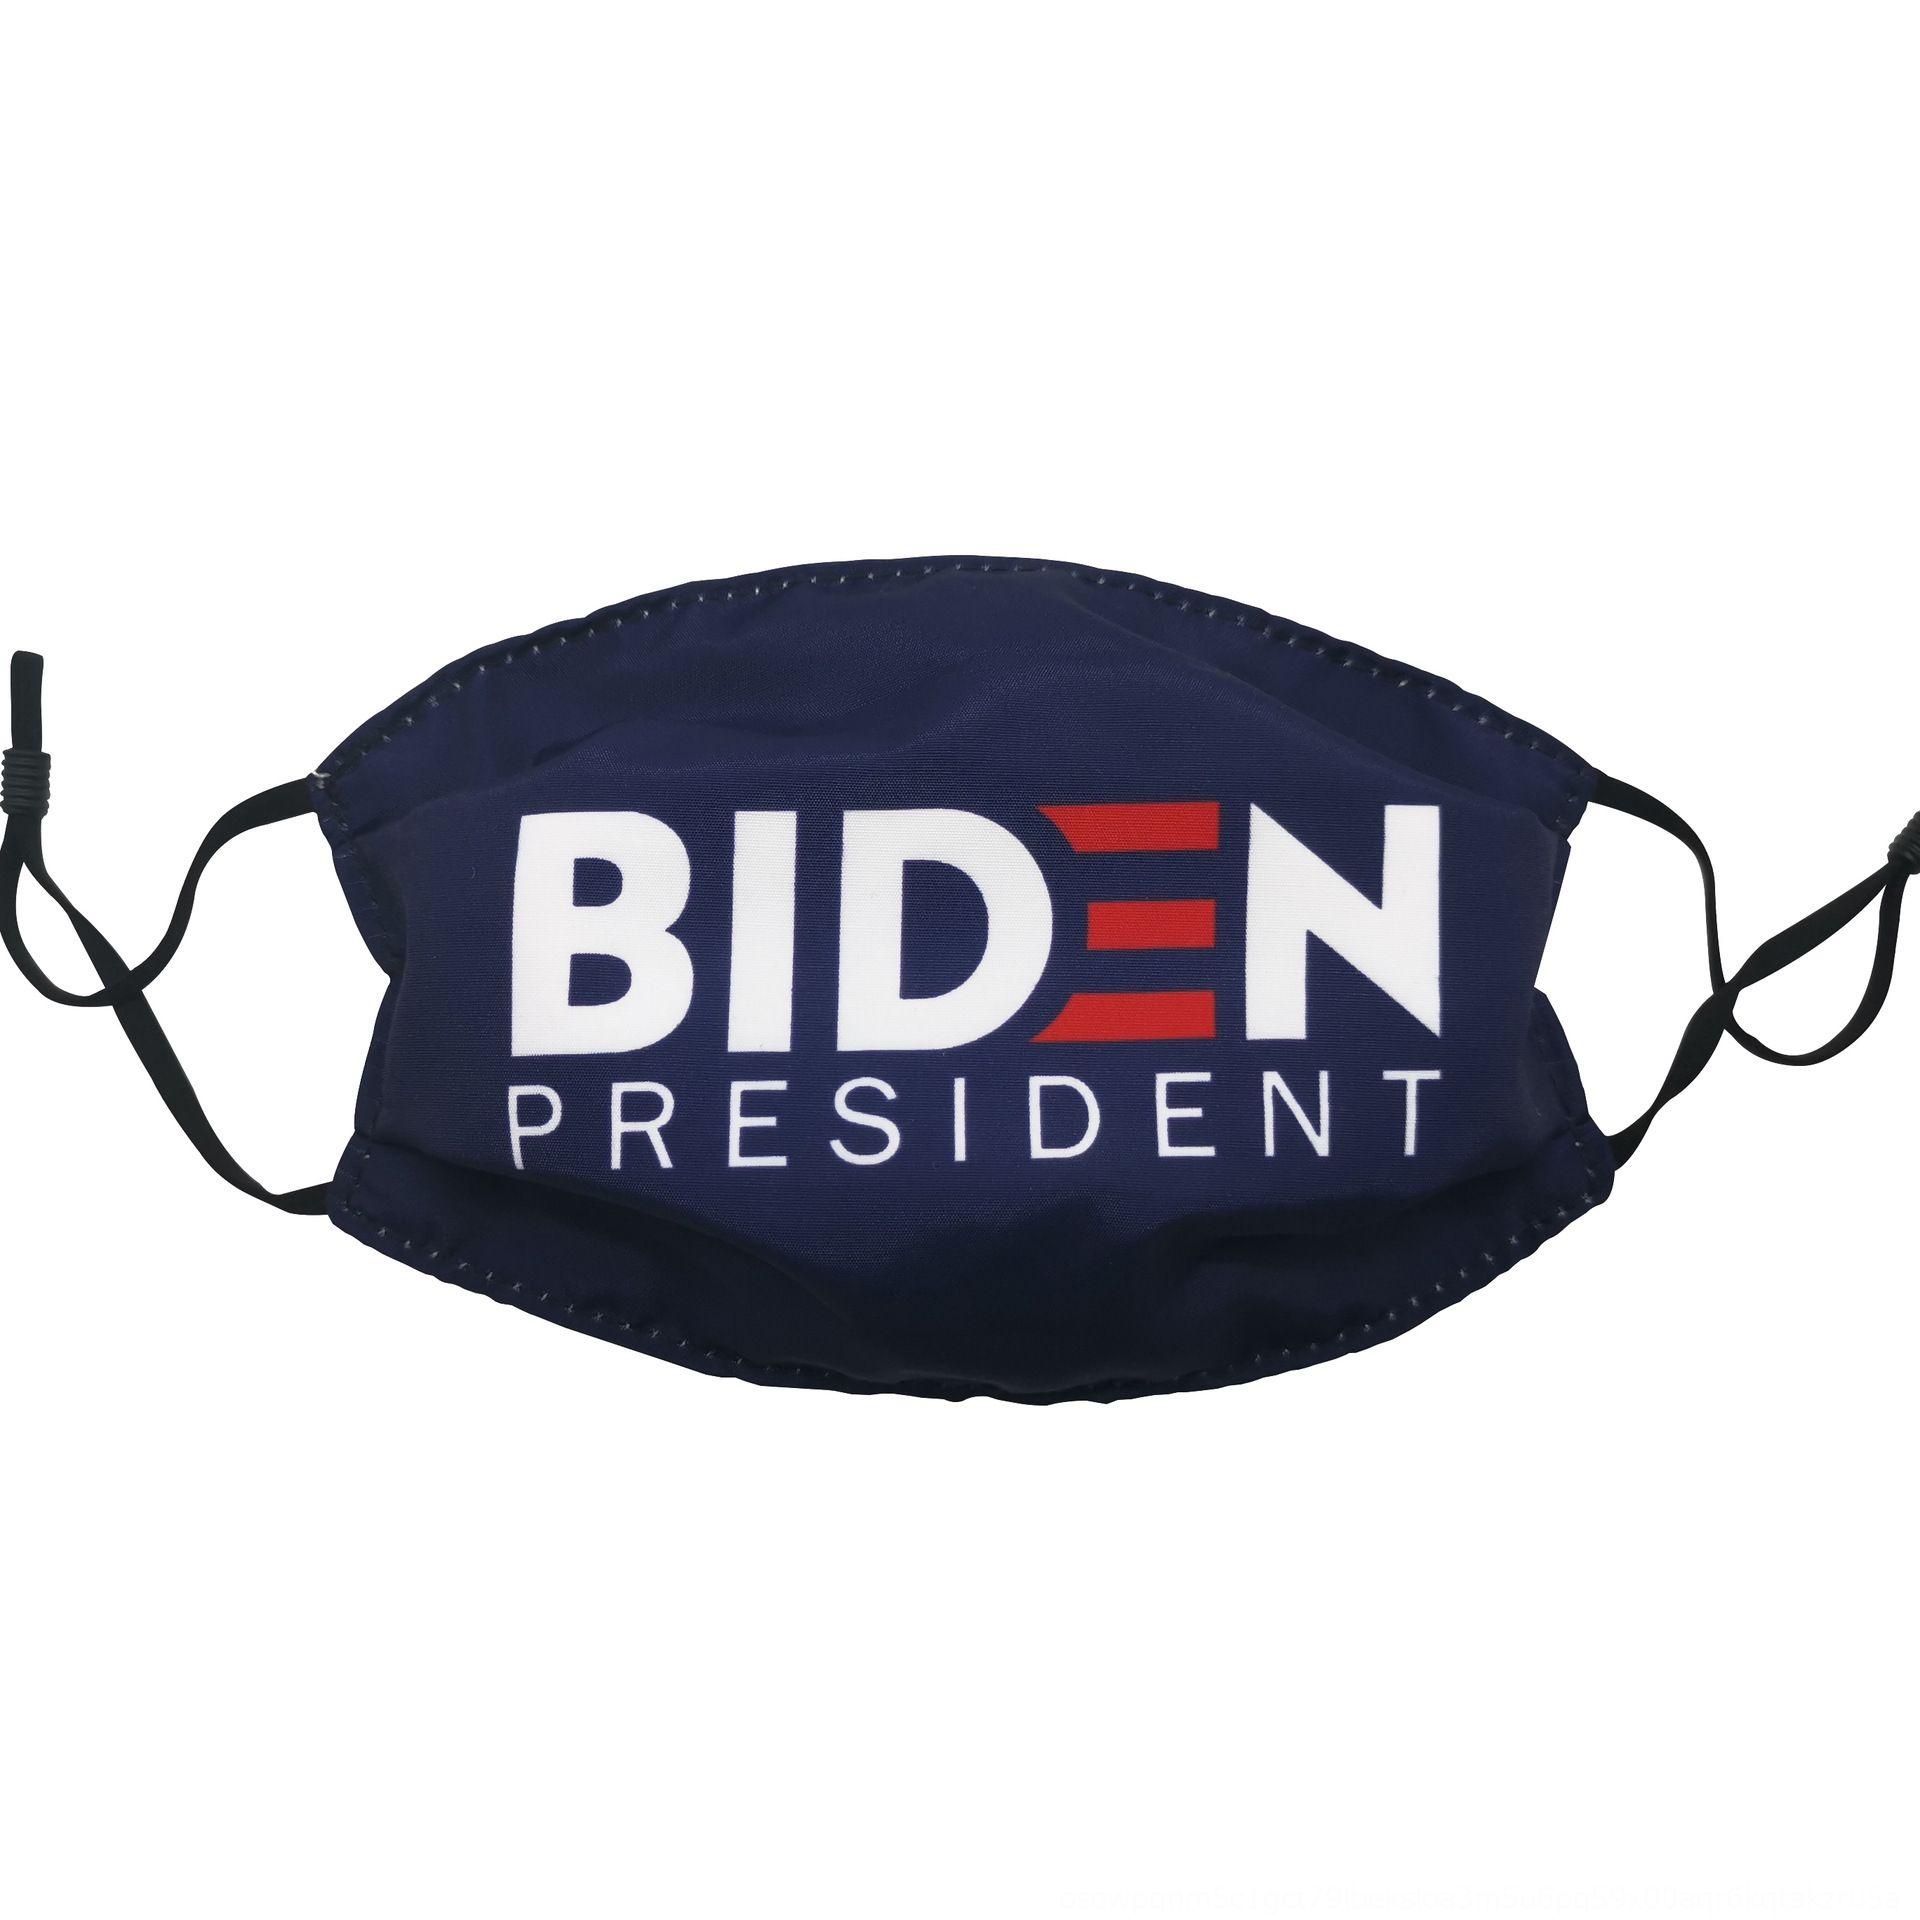 XZC2 Designer 2020 MasksJoe FaceFortnite DHL Biden Élection présidentielle américaine Campagne Polyester Tissu Fortnite MasksSupport Cus